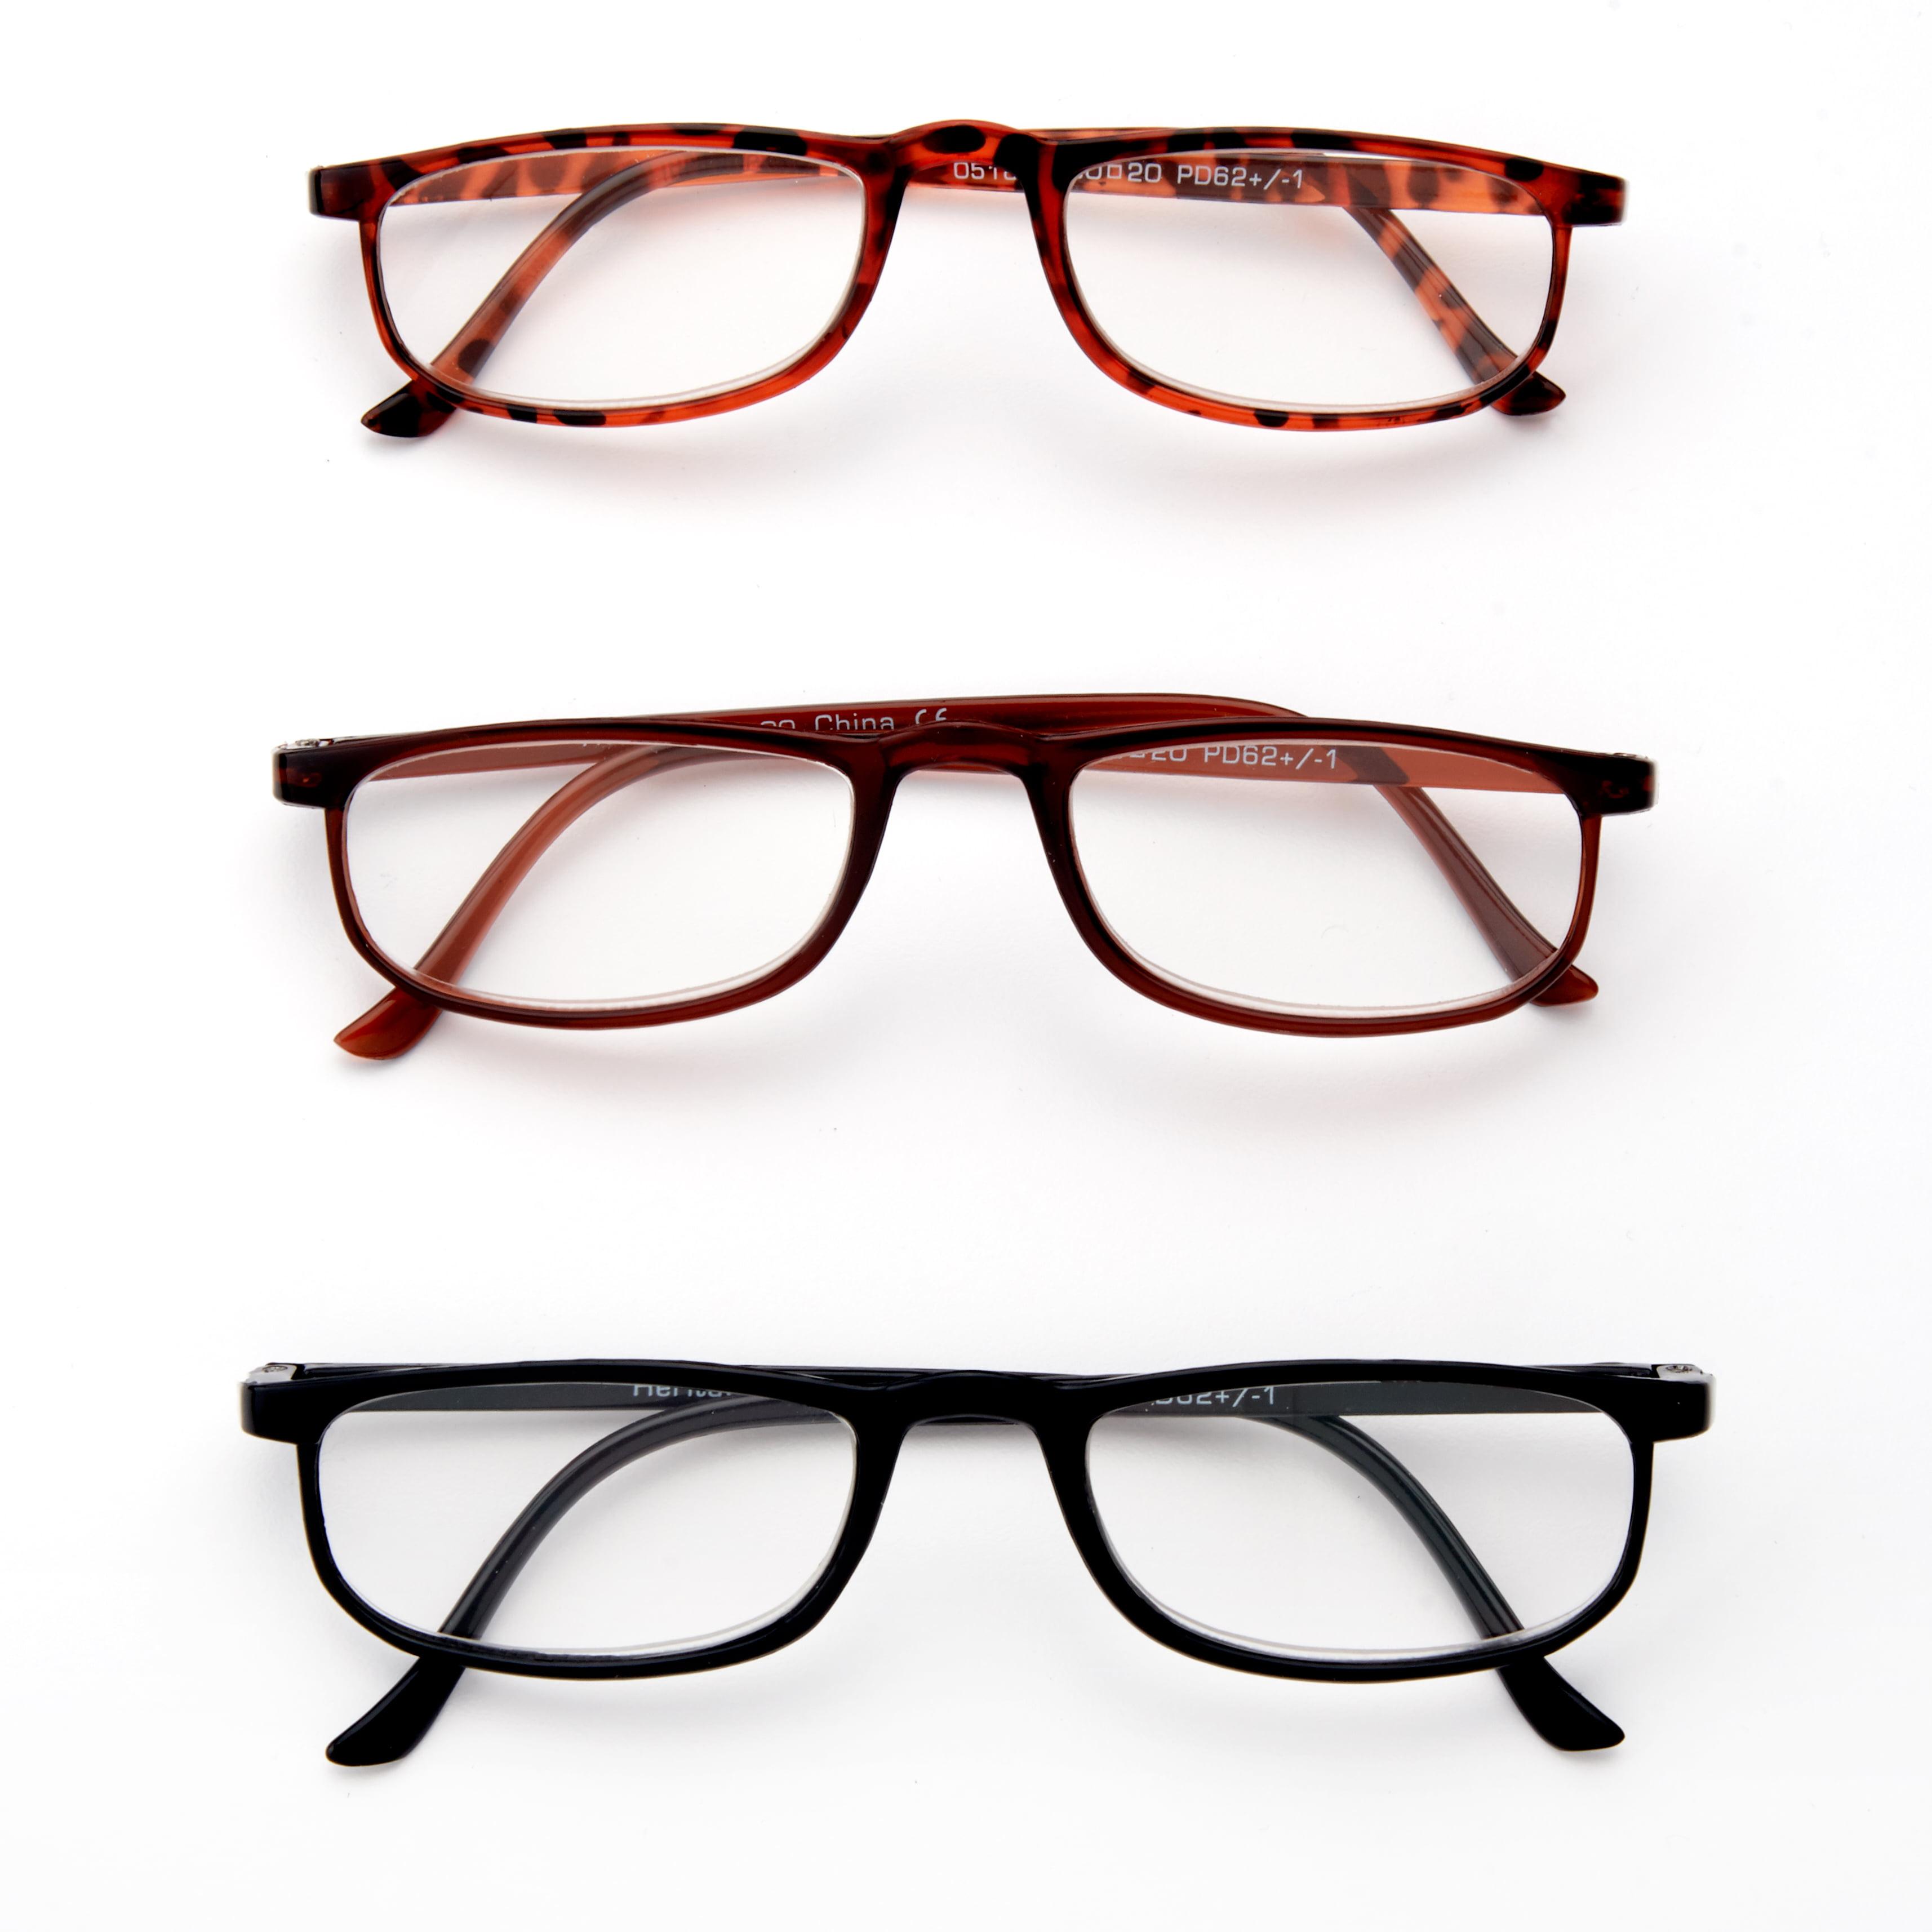 8f46ba3b75ba Equate Heritage Reading Glasses, +3.00, Assorted Colors, 3 Pack -  Walmart.com